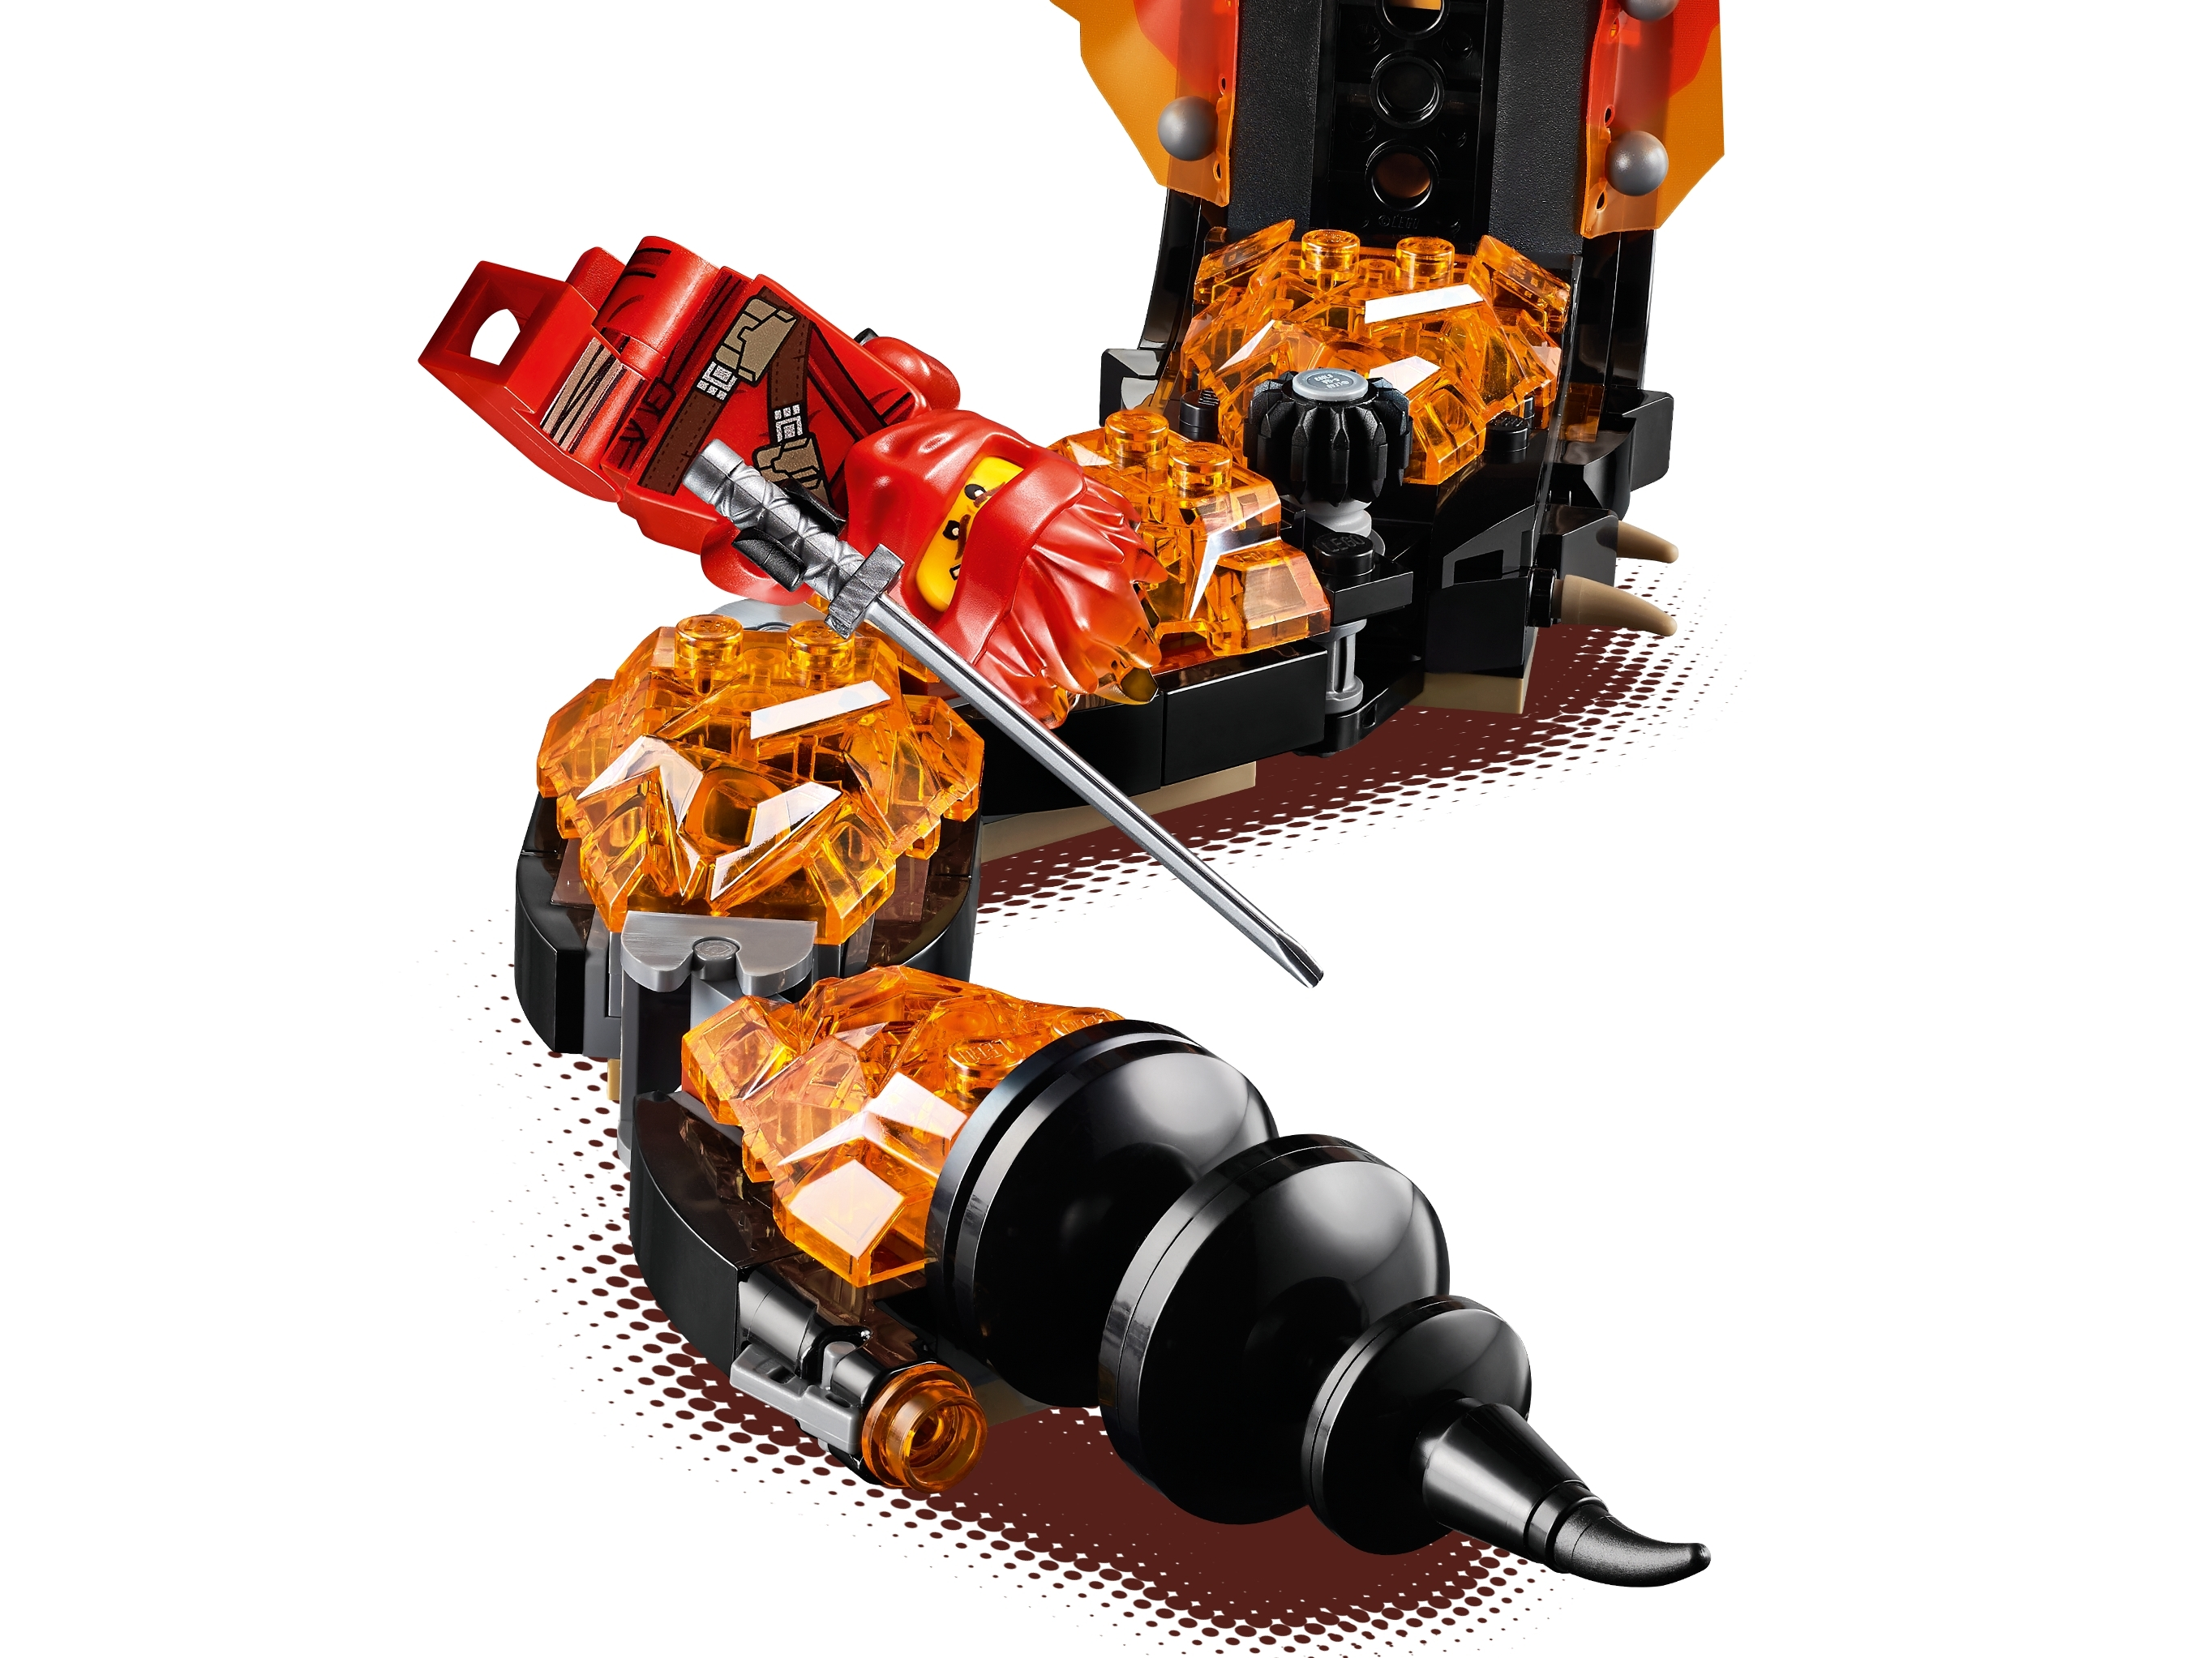 LEGO 70674 Ninjago Fire Fang Set BRAND NEW463 pcs NEW SEALED!